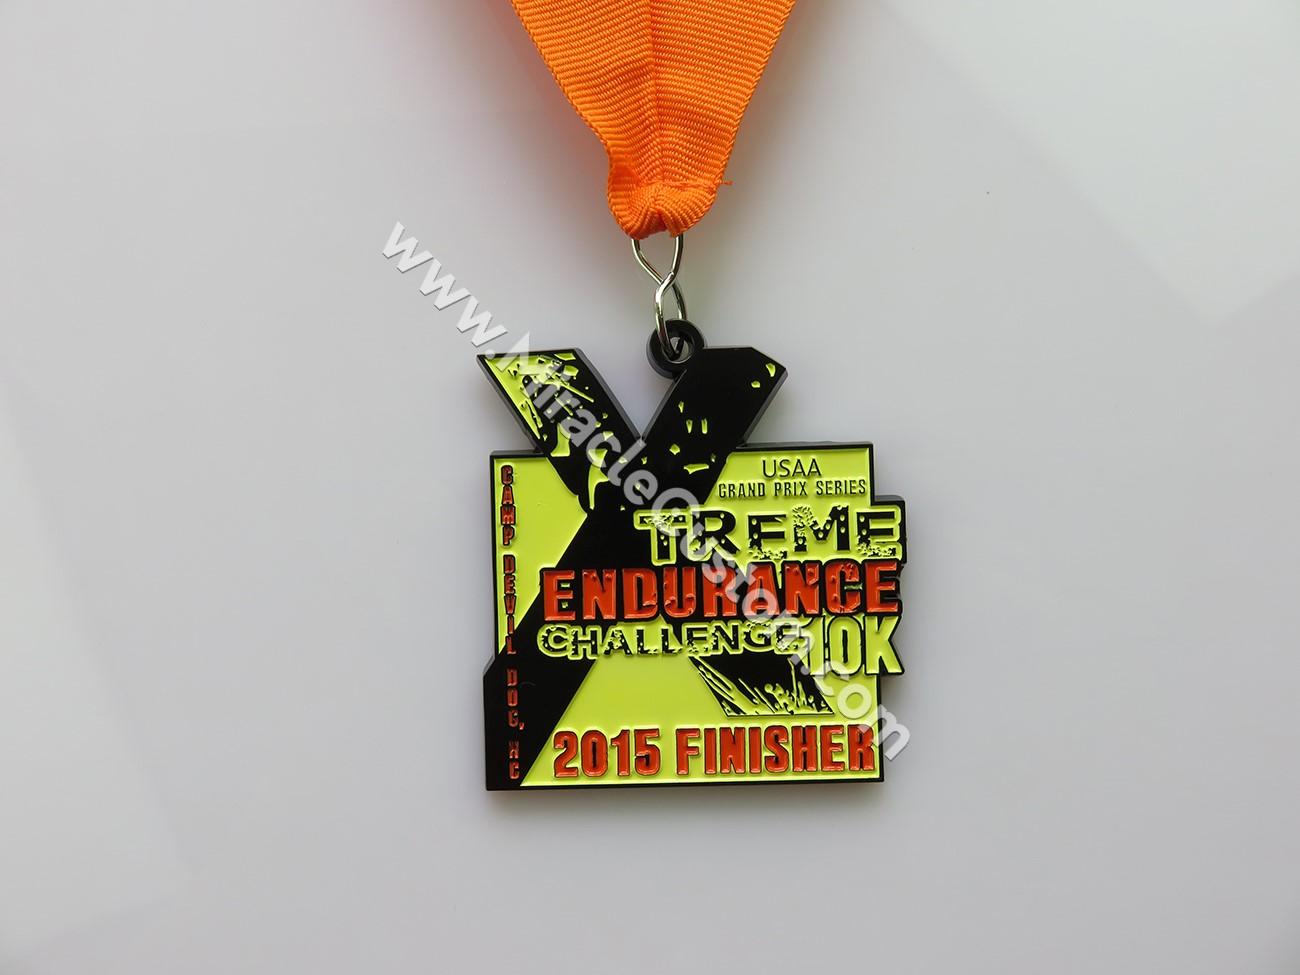 custom finisher medals